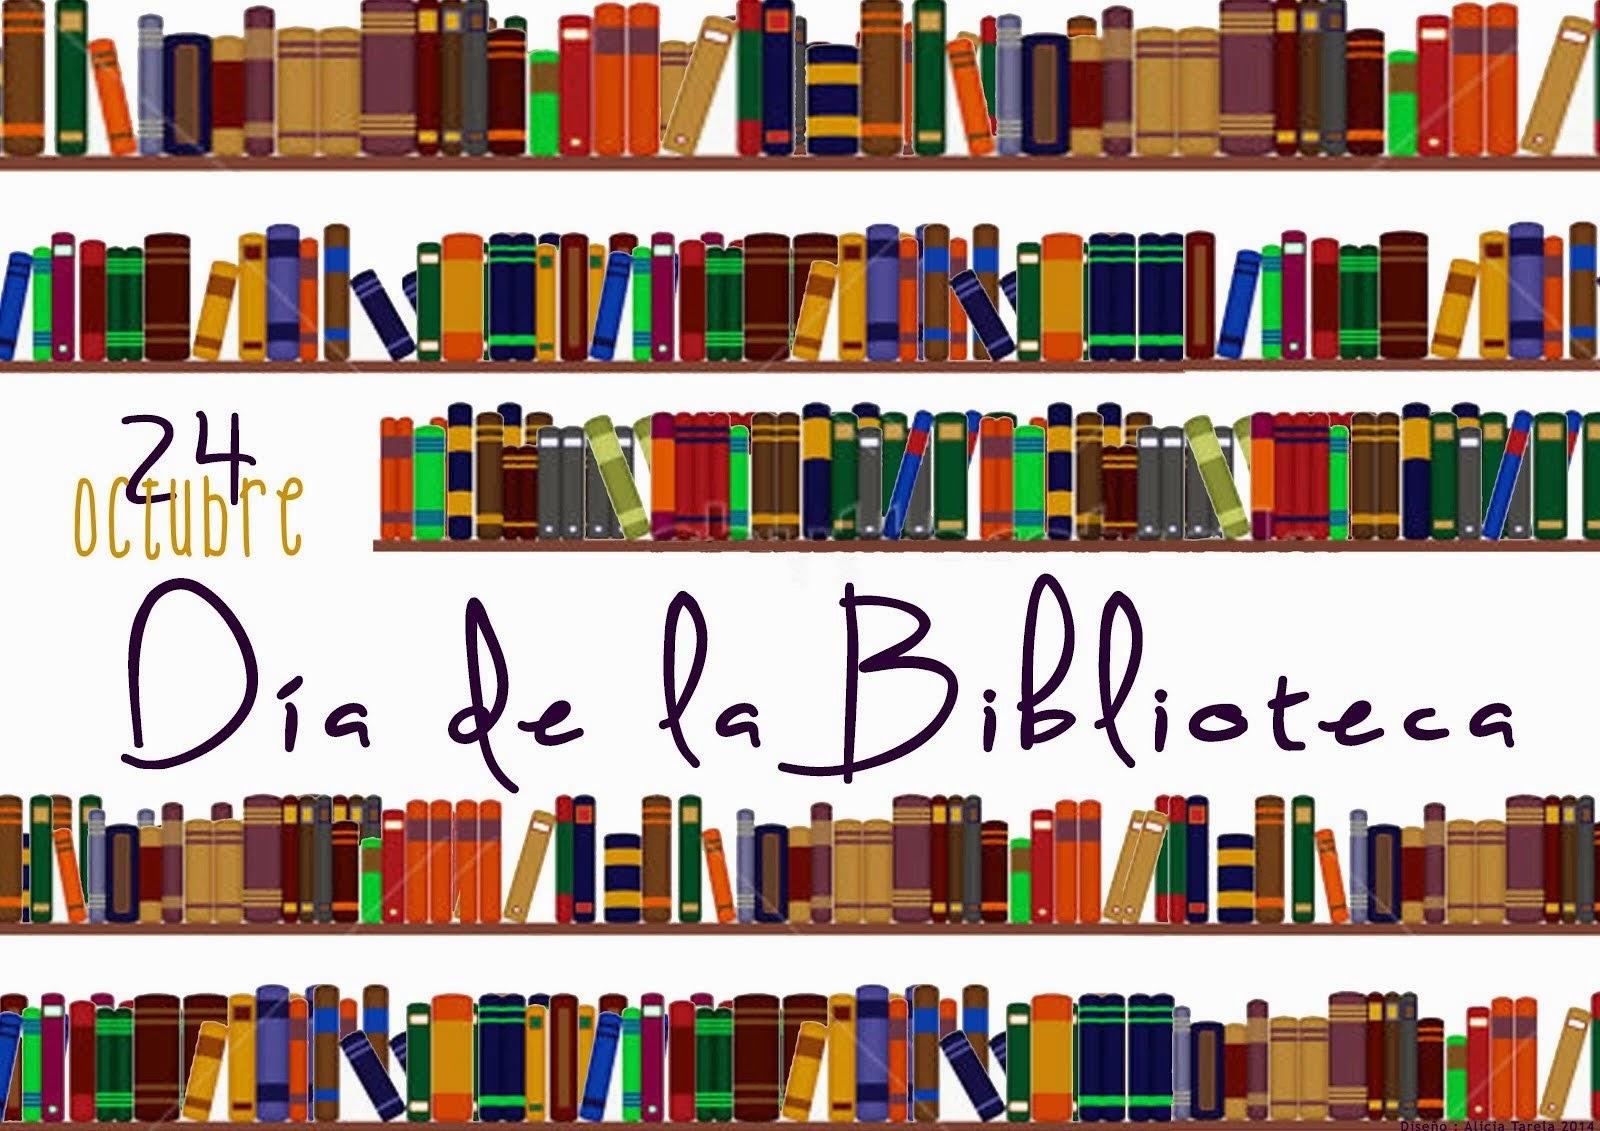 http://www.amigosdelibro.com/images/PROGRAMA%20DA%20DE%20LA%20BIBLIOTECA%202014.pdf